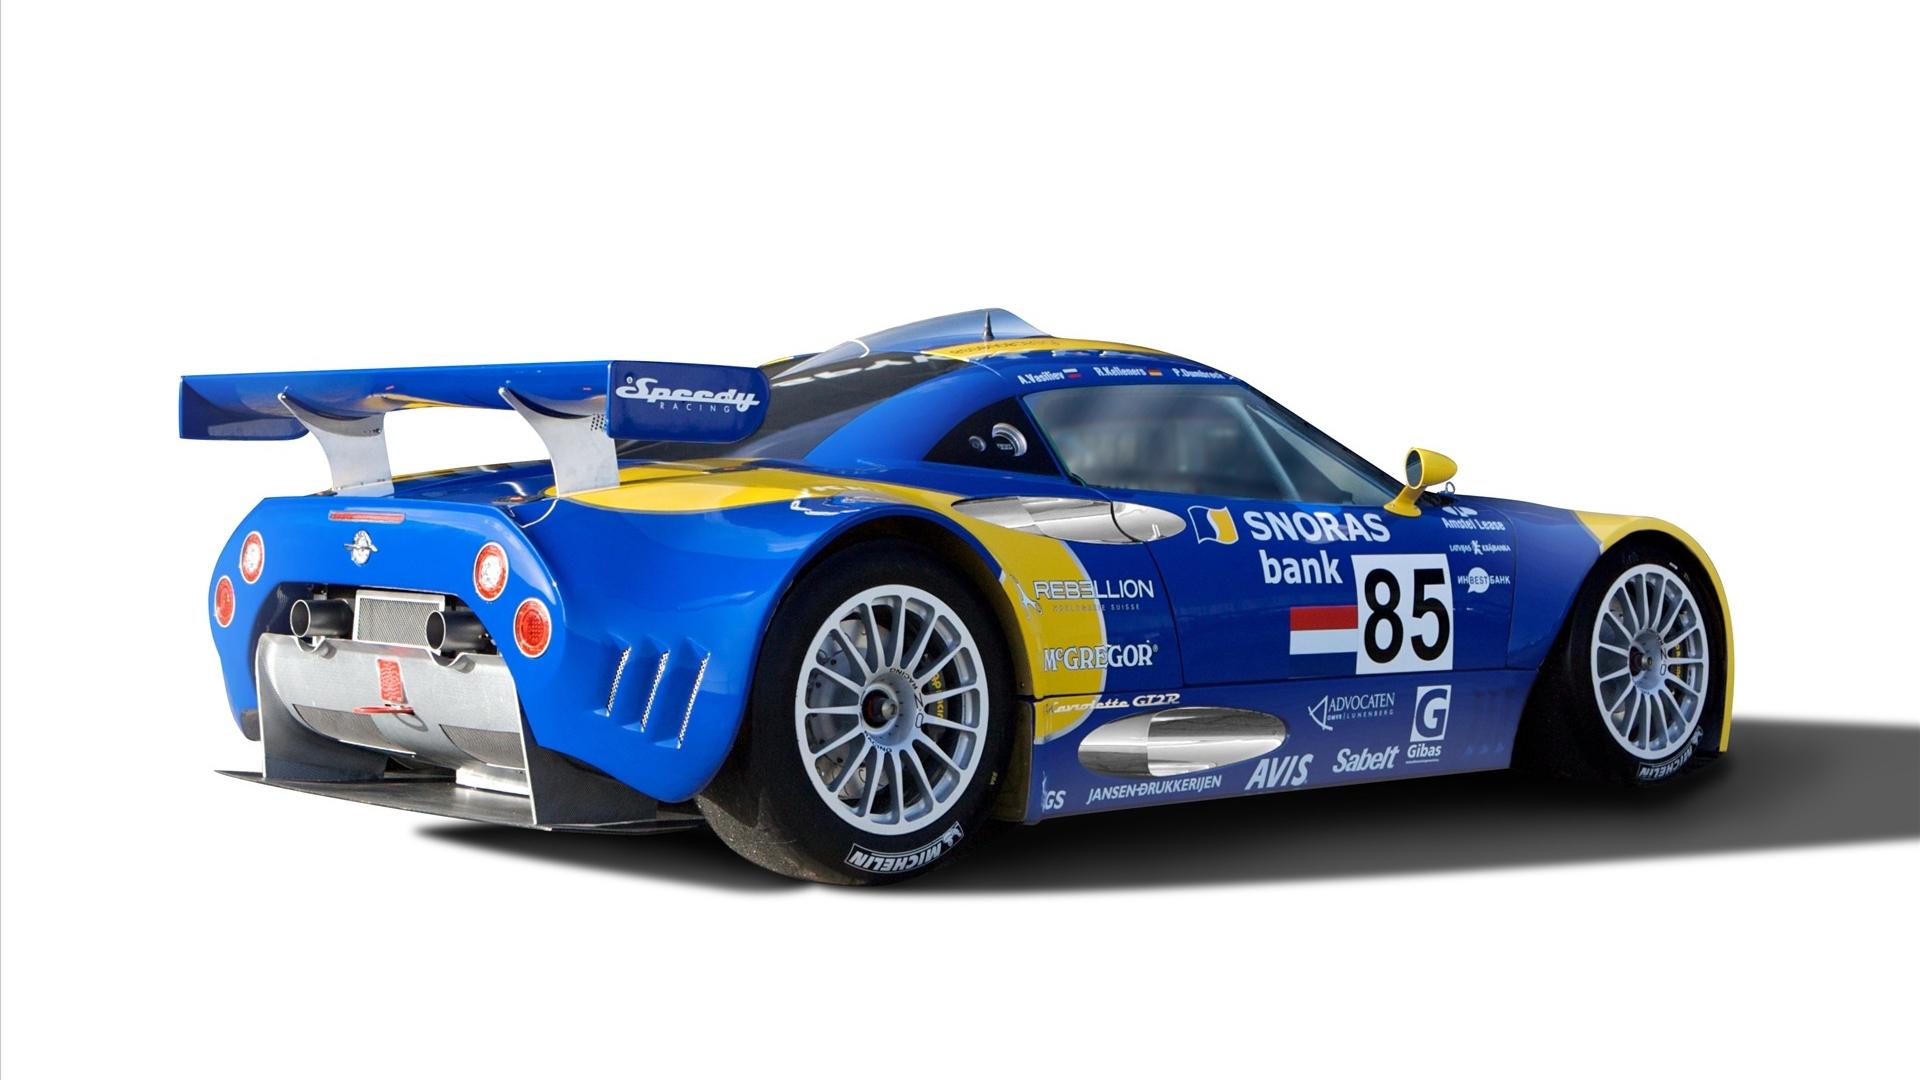 High speed sports car